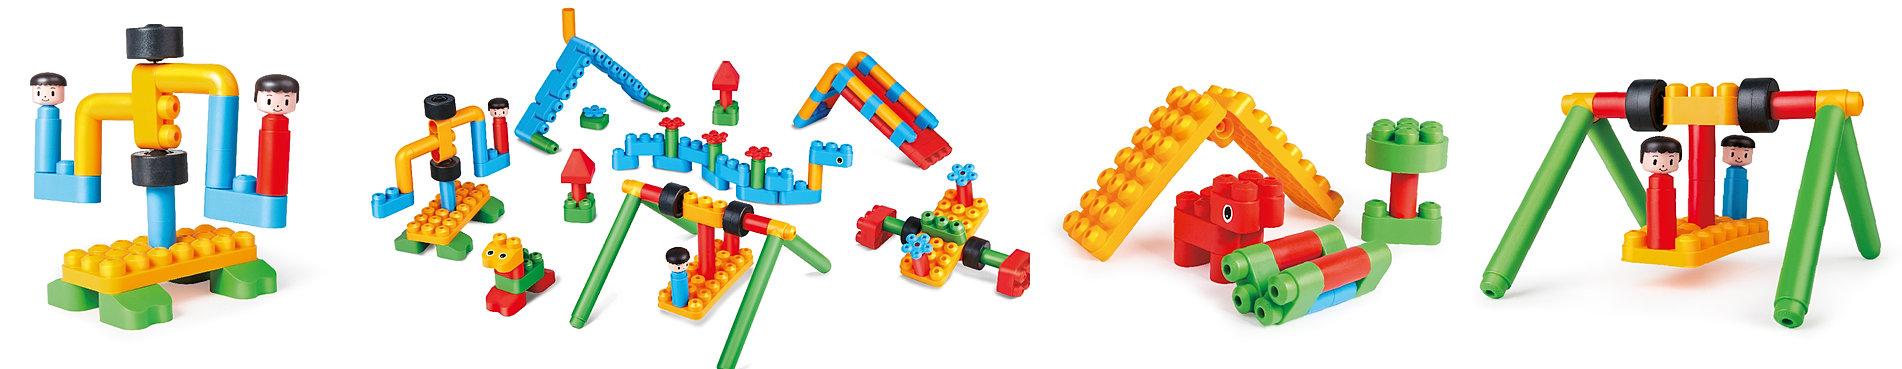 Adventure Playground Kit